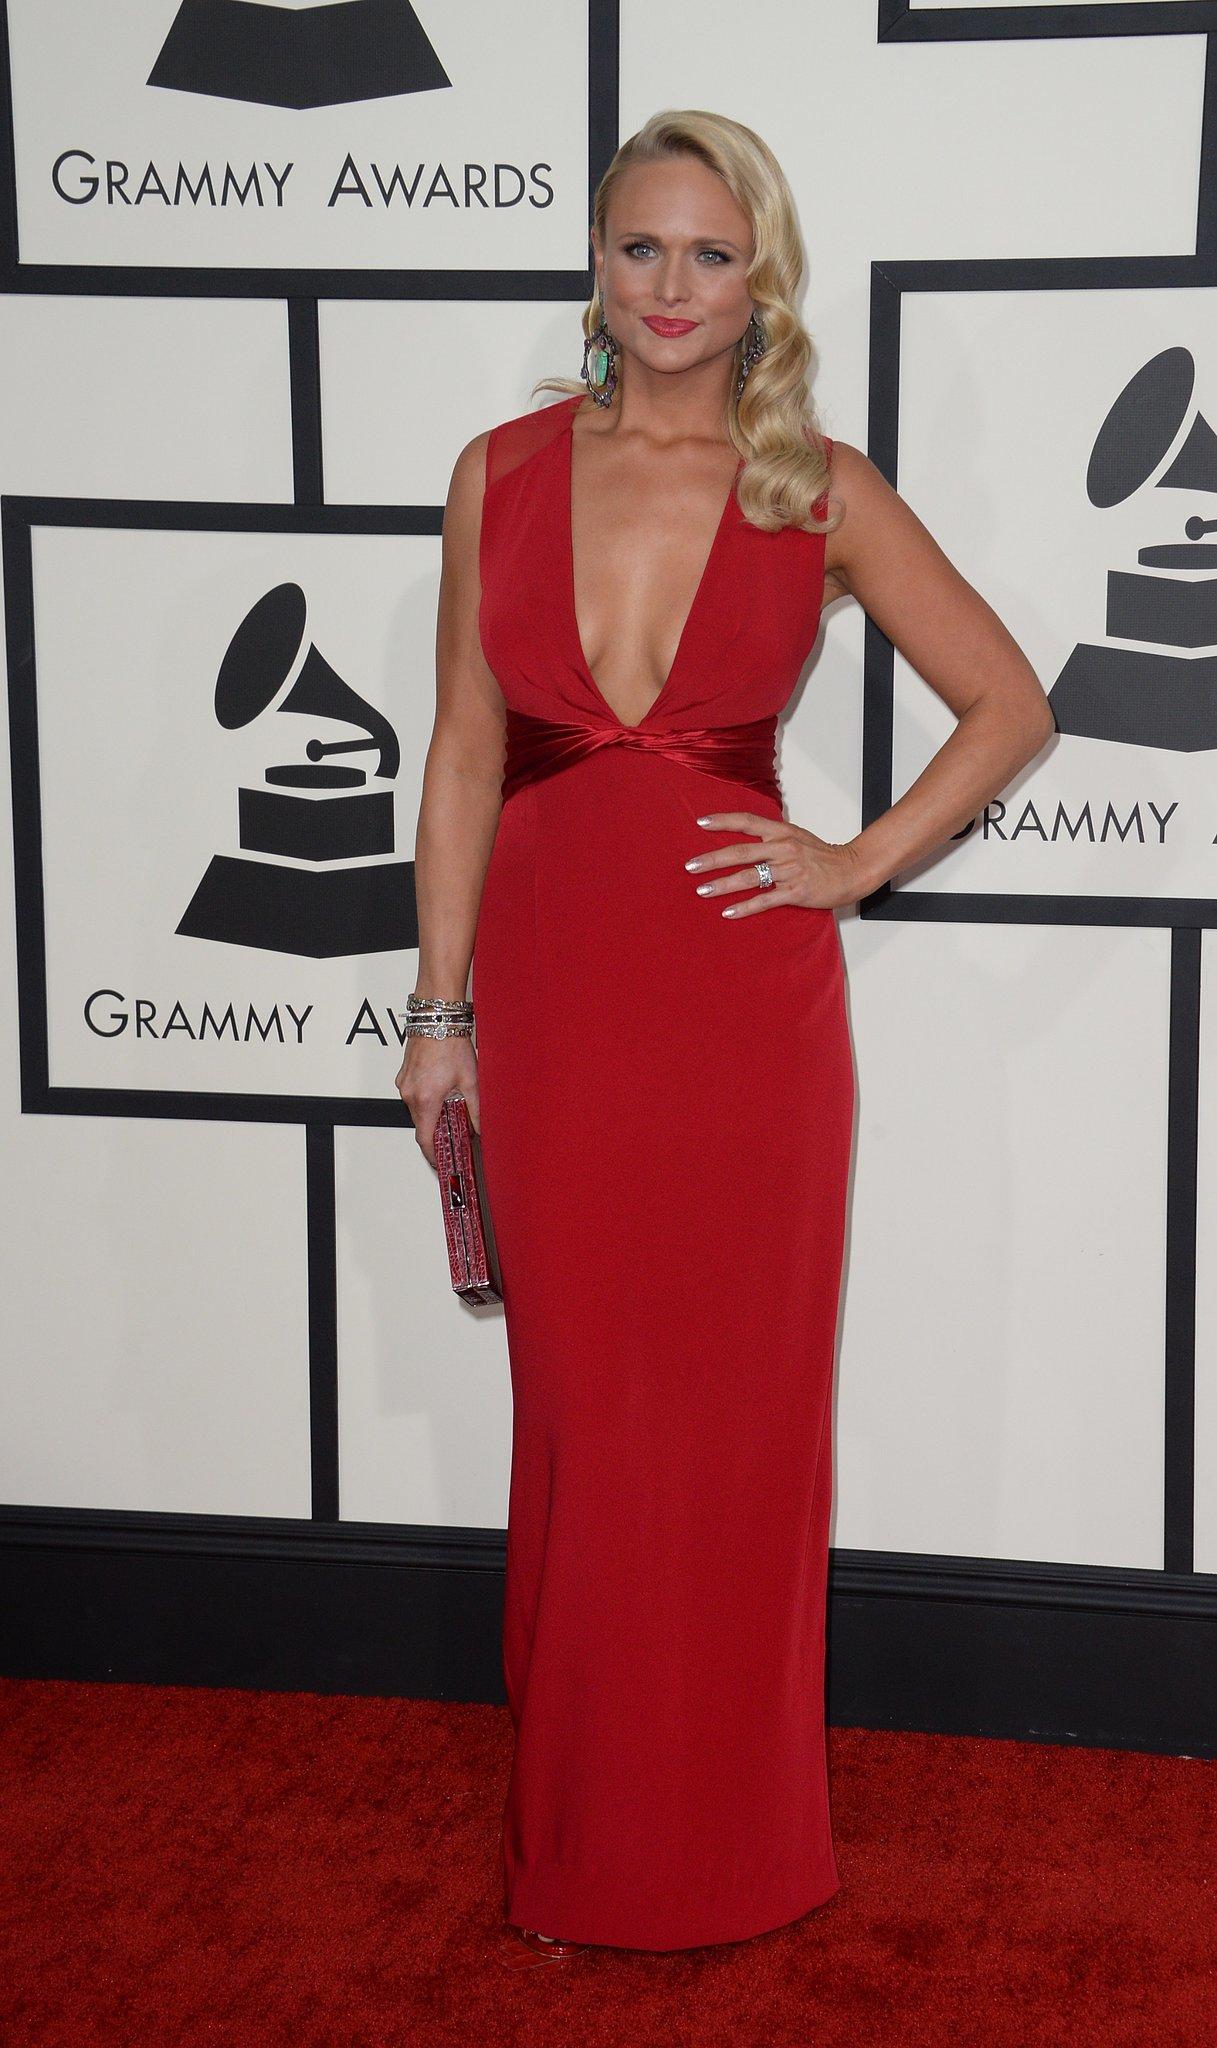 Miranda Lambert at the Grammys 2014